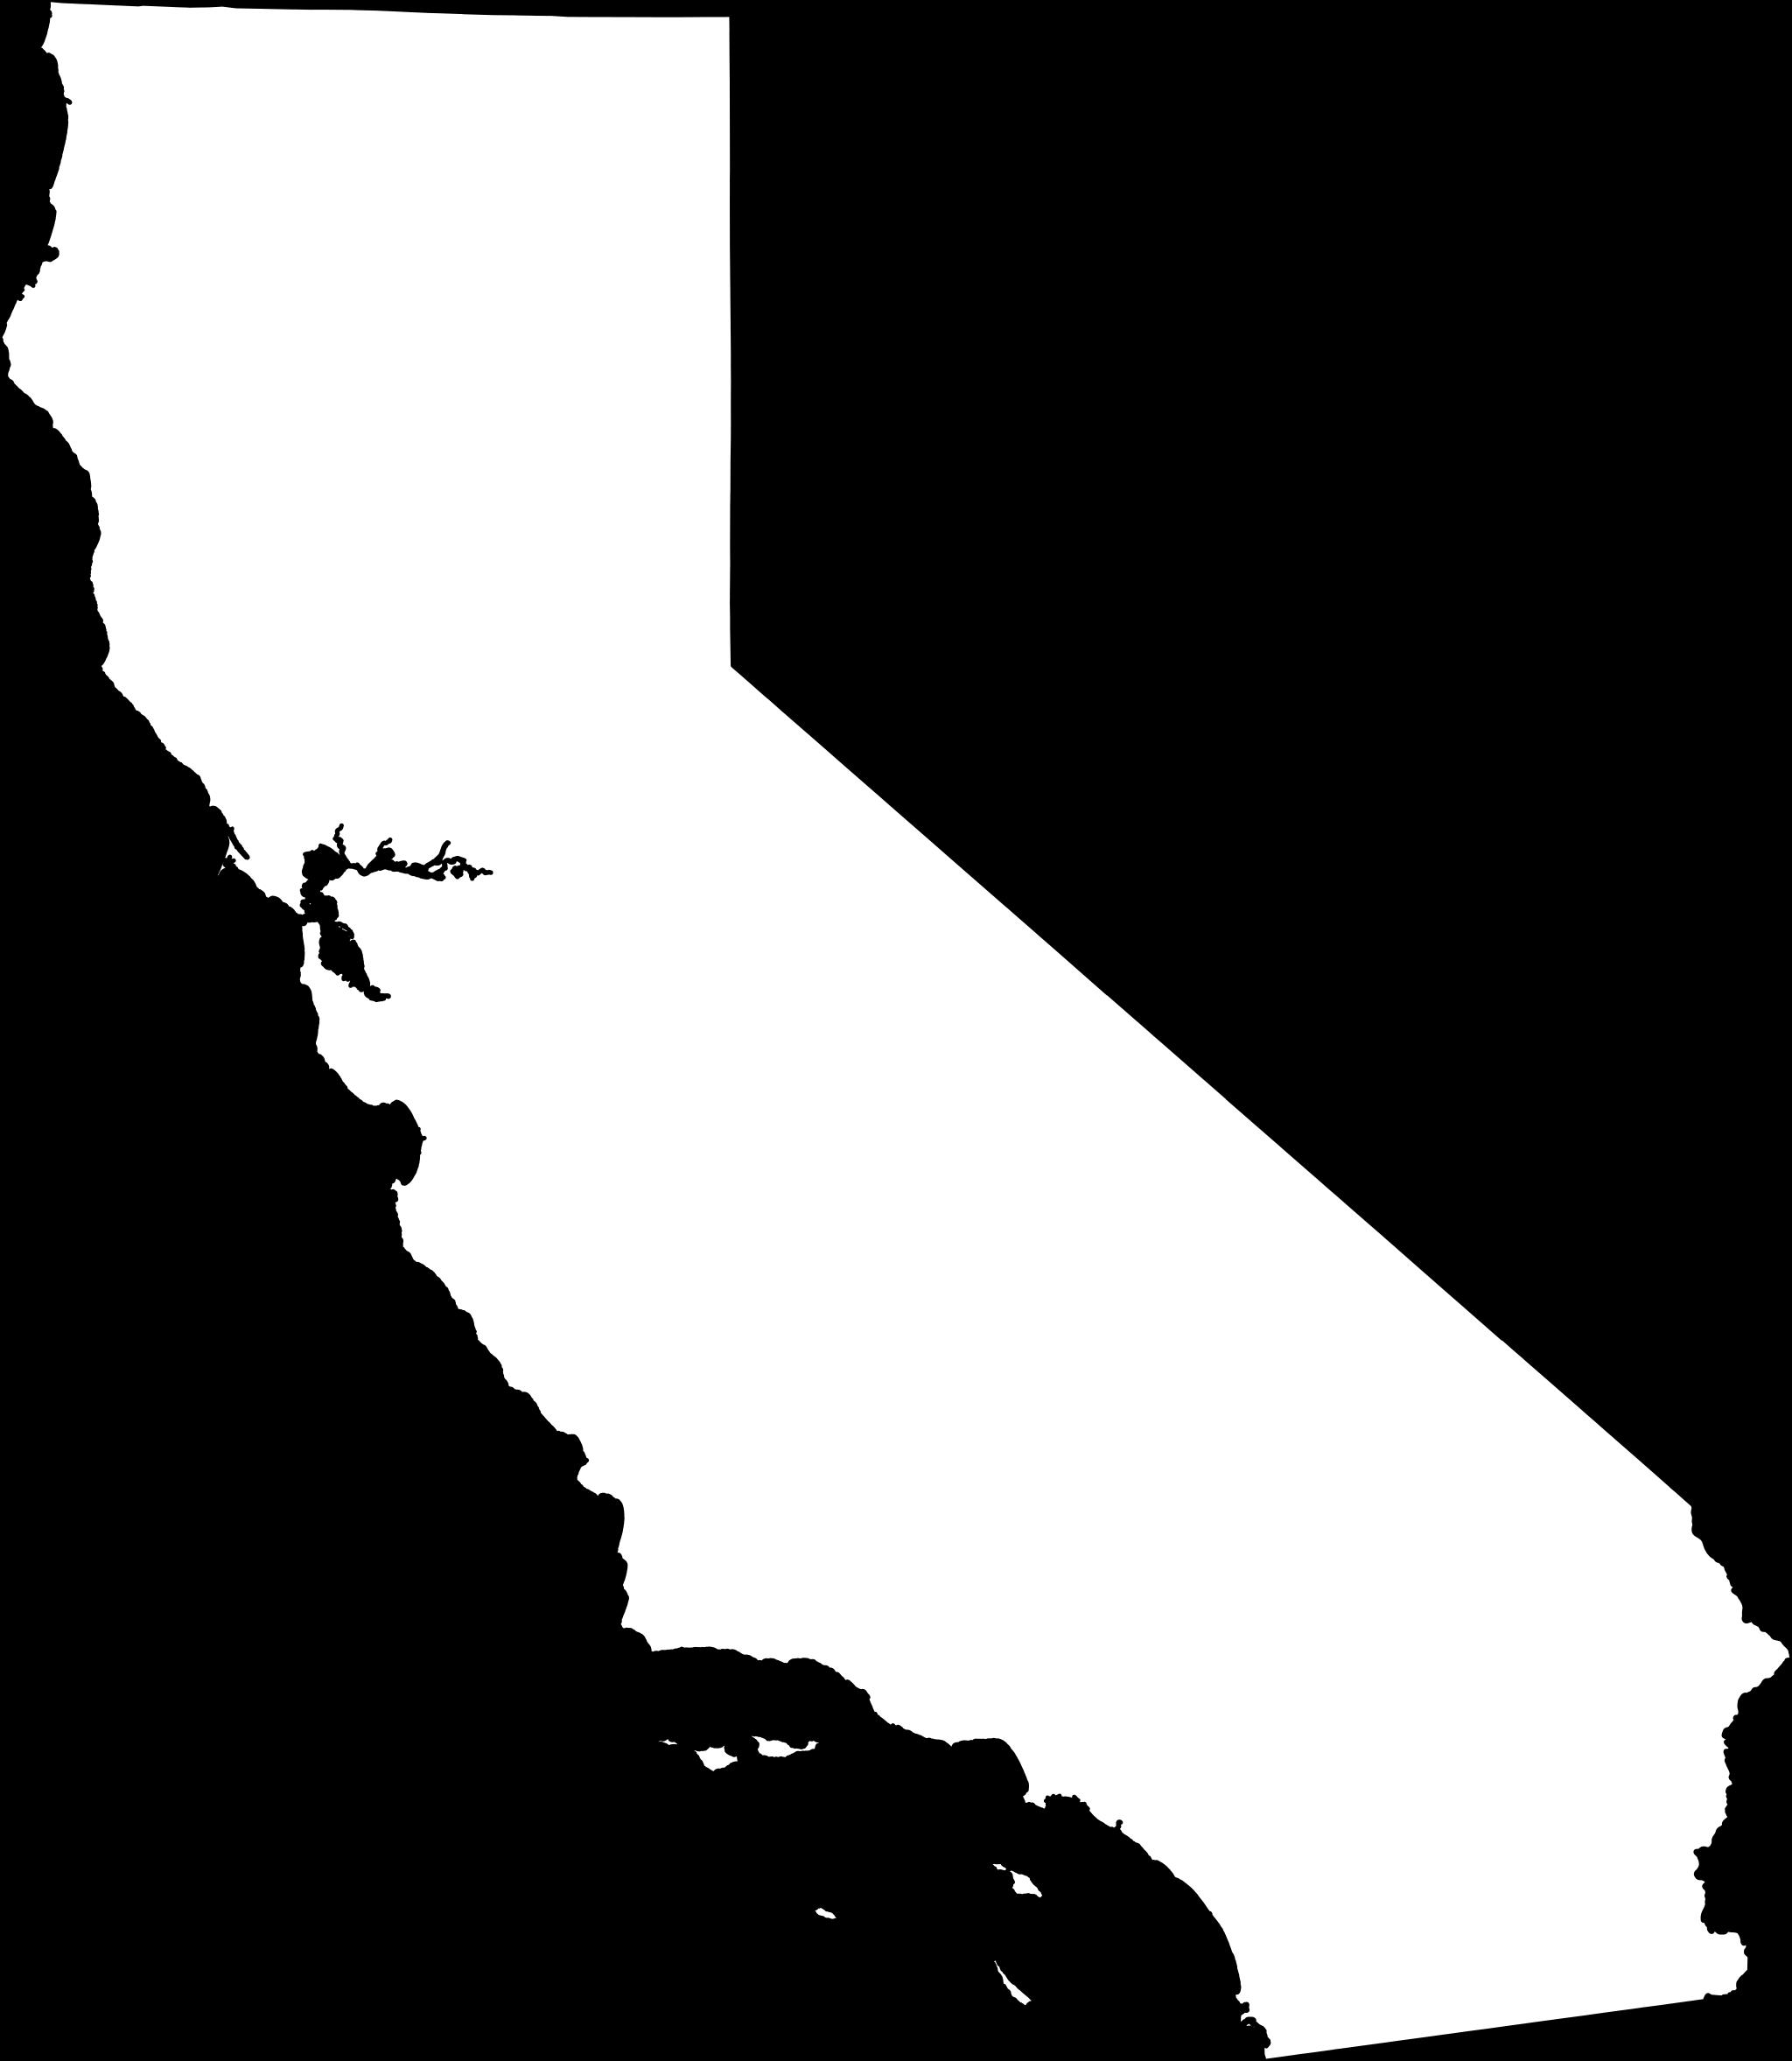 California State Outline High School Golf California State Outline State Outline California Outline